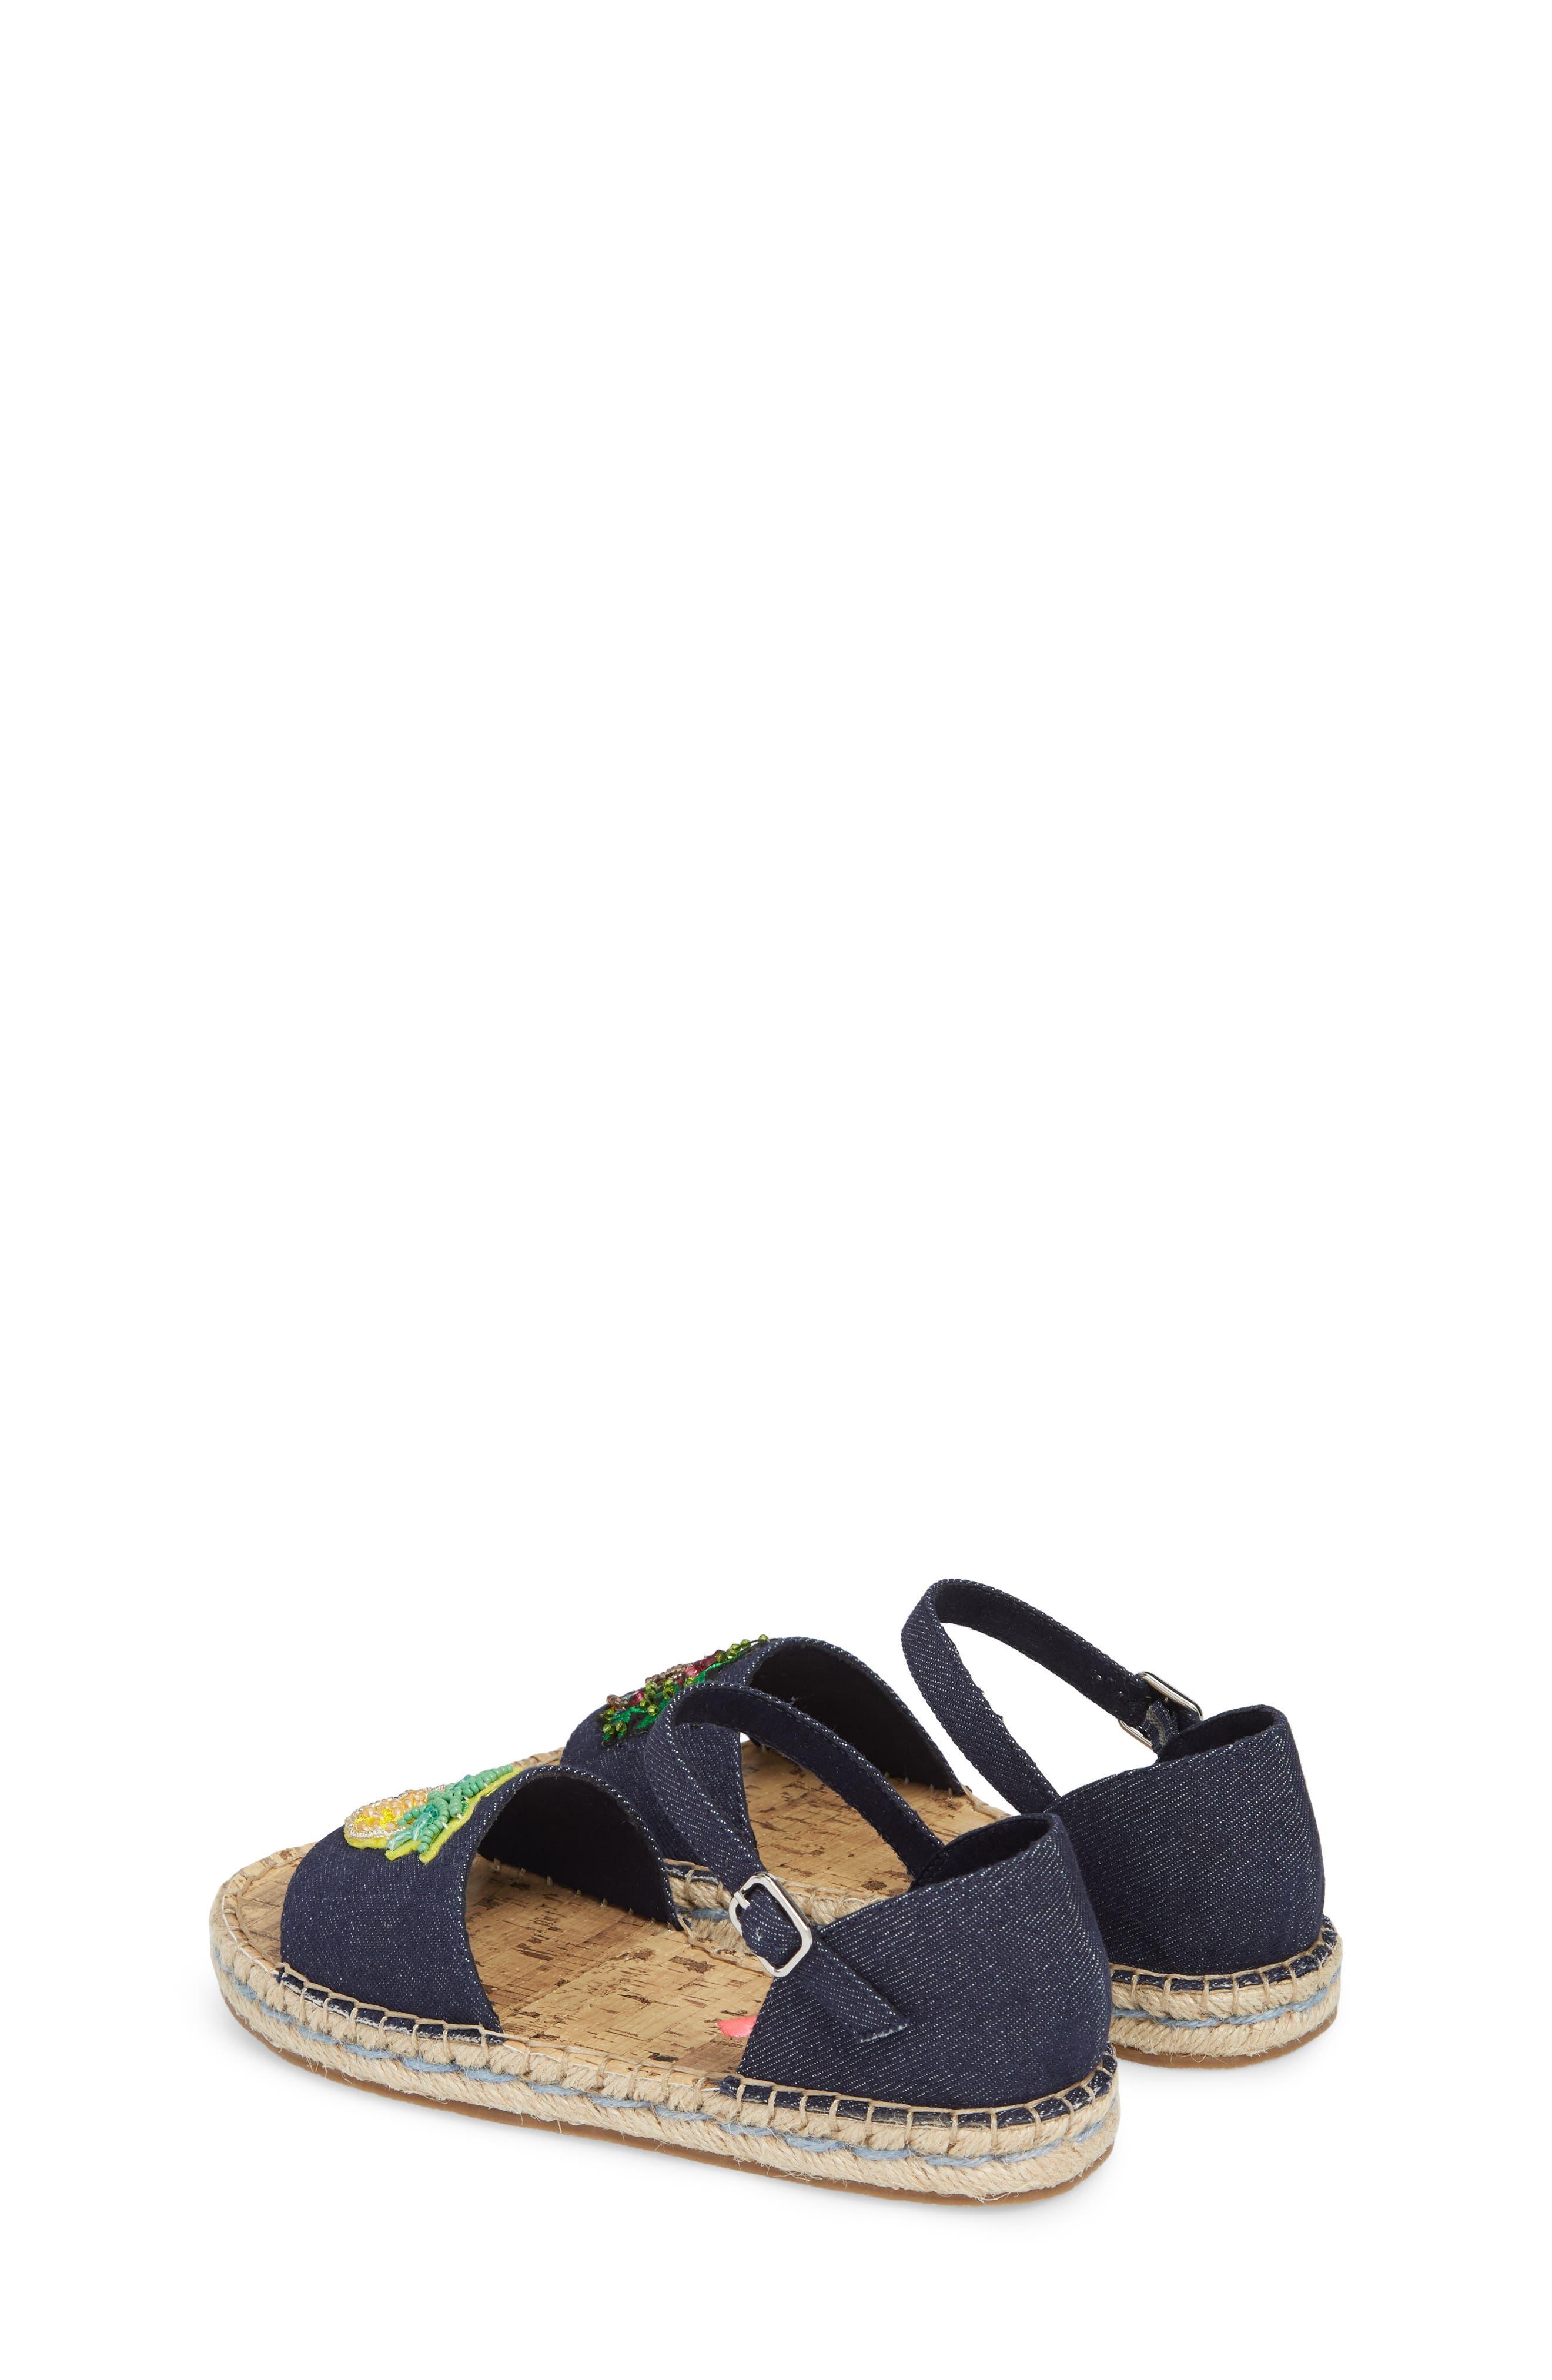 JLUAO Tropical Embellished Sandal,                             Alternate thumbnail 2, color,                             Fruit Multi